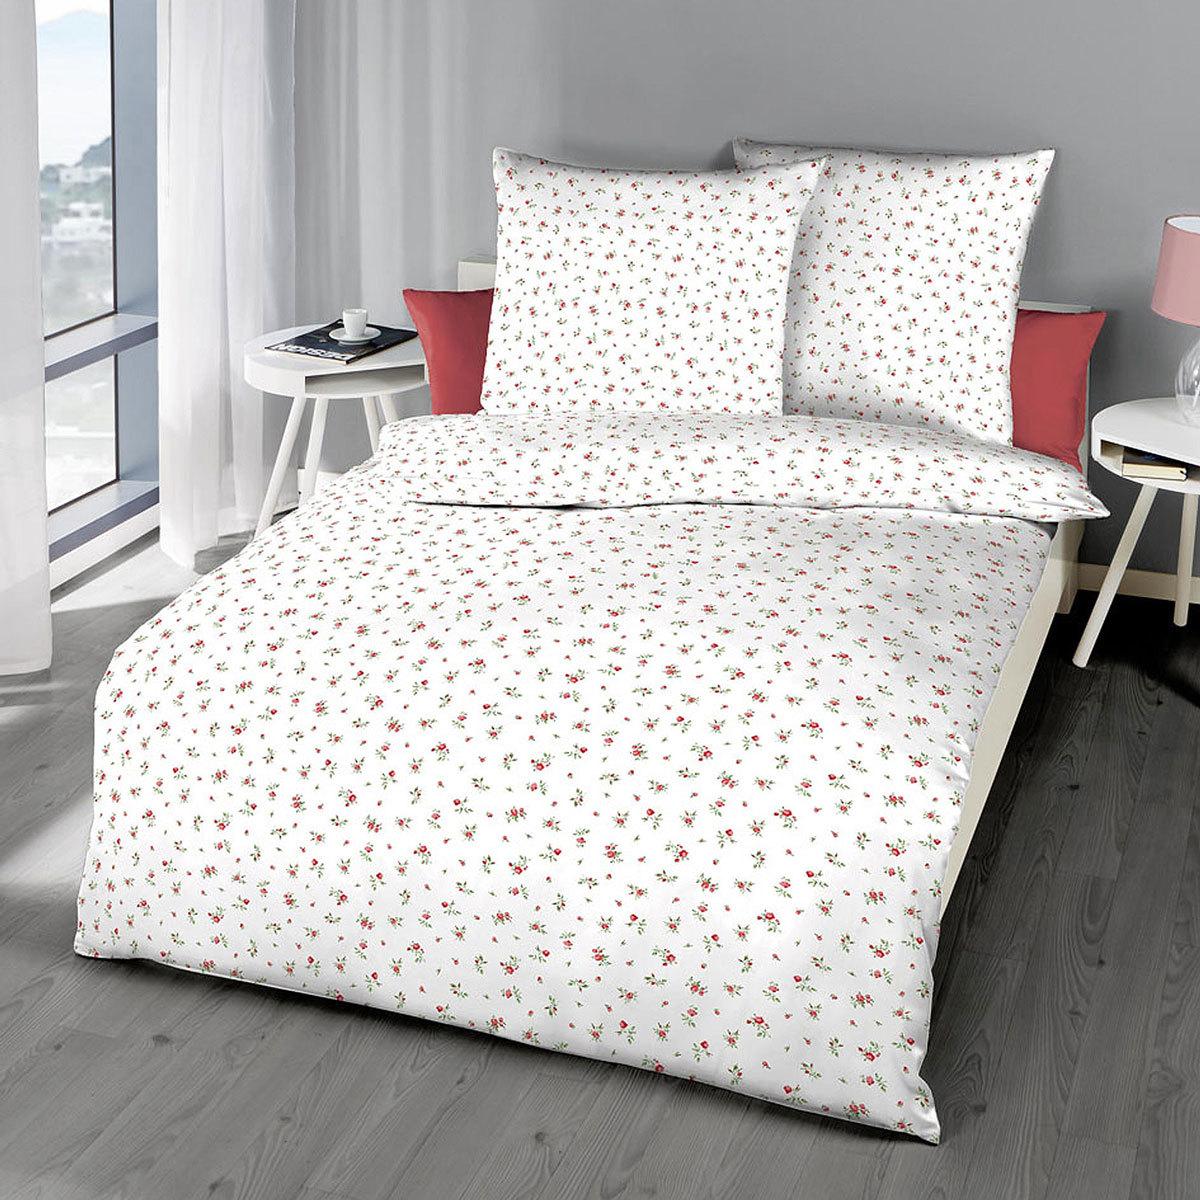 kaeppel mako satin bettw sche windr schen rot erfolgsteams frankfurt. Black Bedroom Furniture Sets. Home Design Ideas